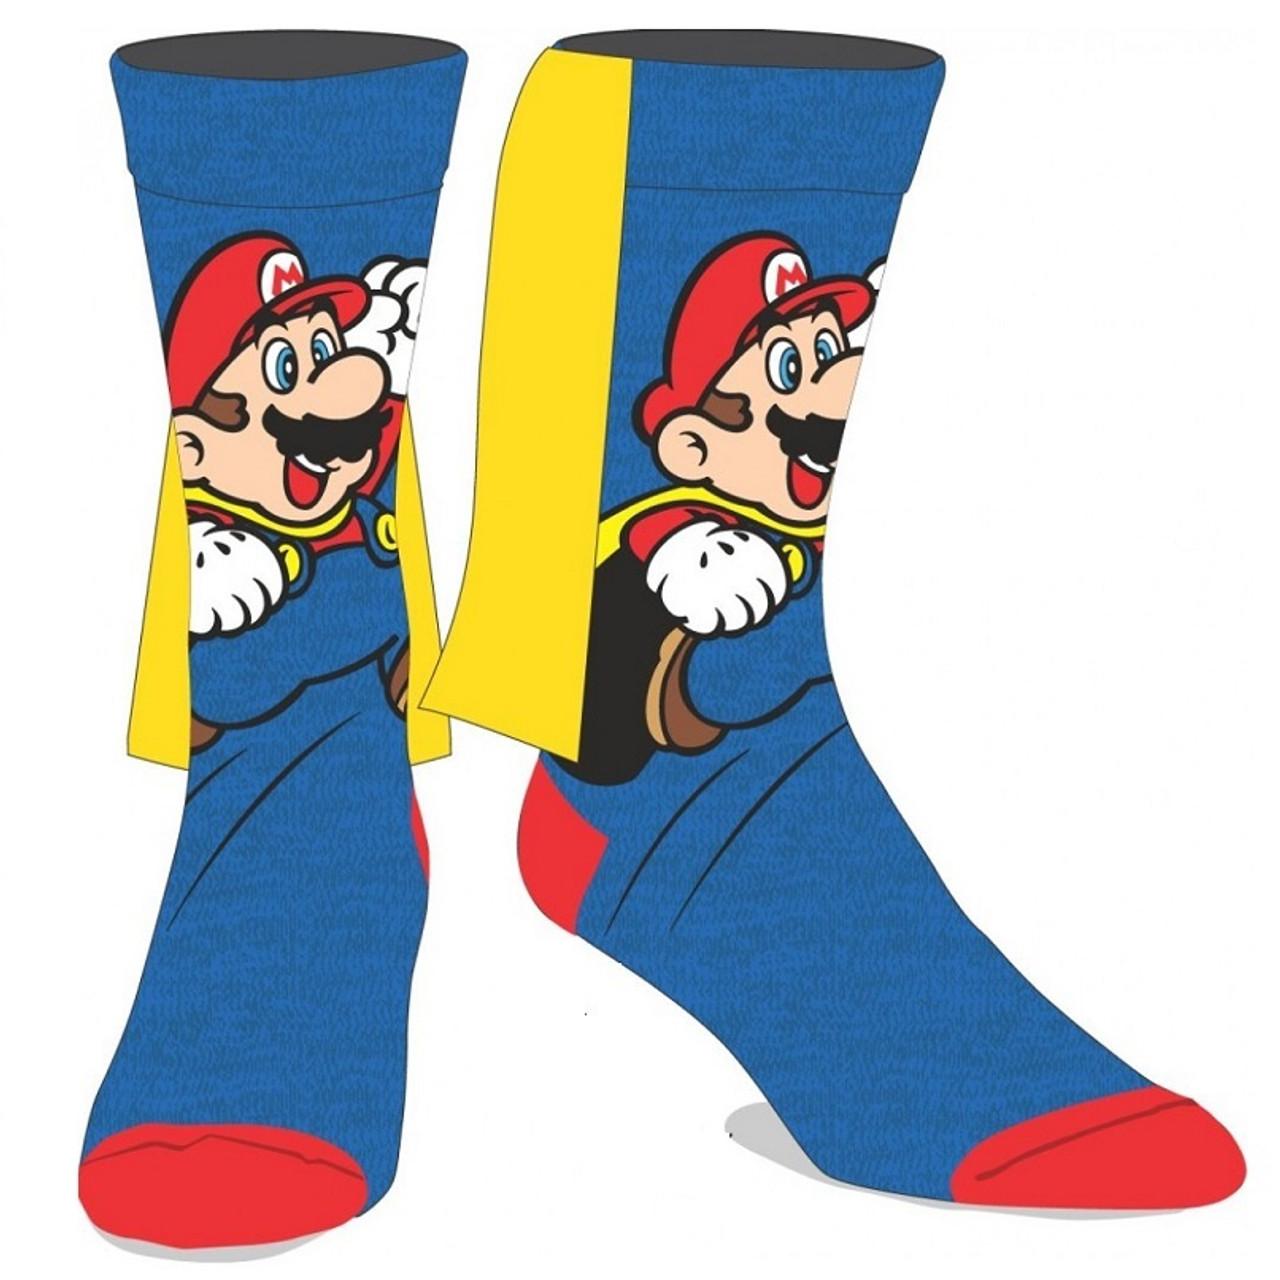 Super Mario Christmas Stocking.Nintendo Super Mario Crew Socks With Cape By Bioworld